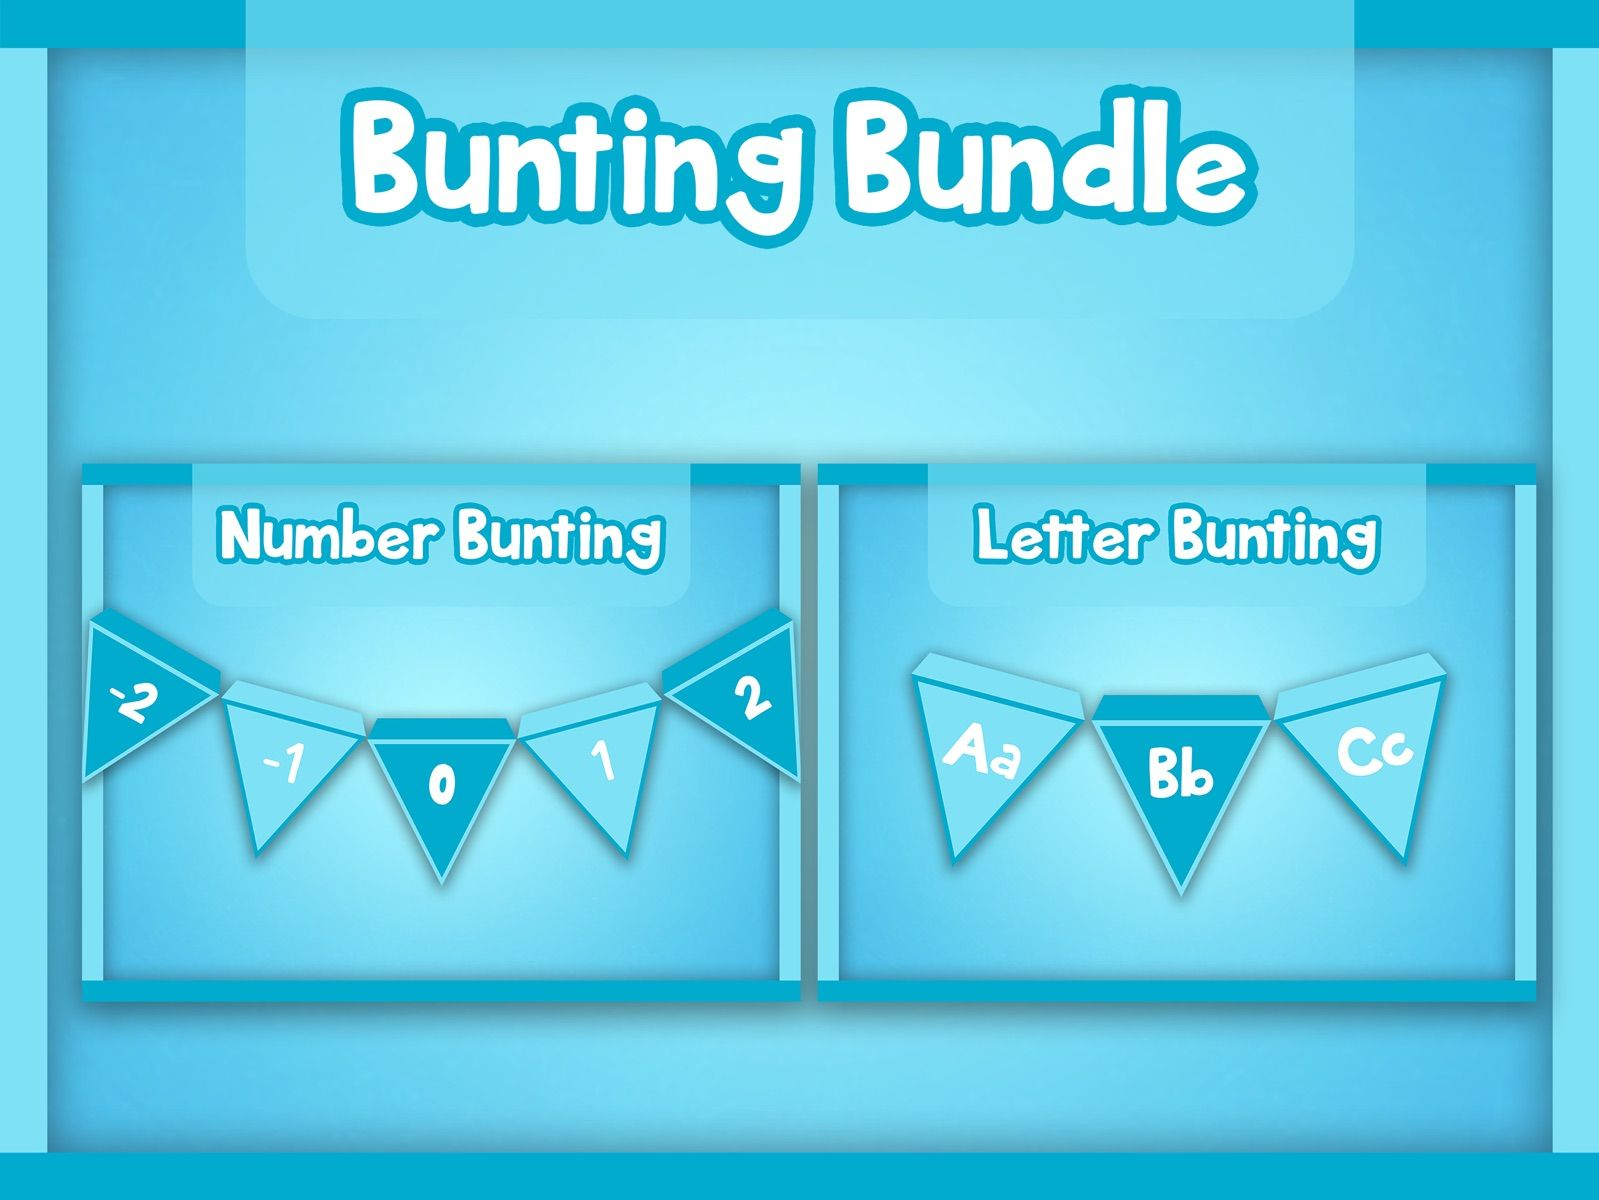 Bunting Bundle